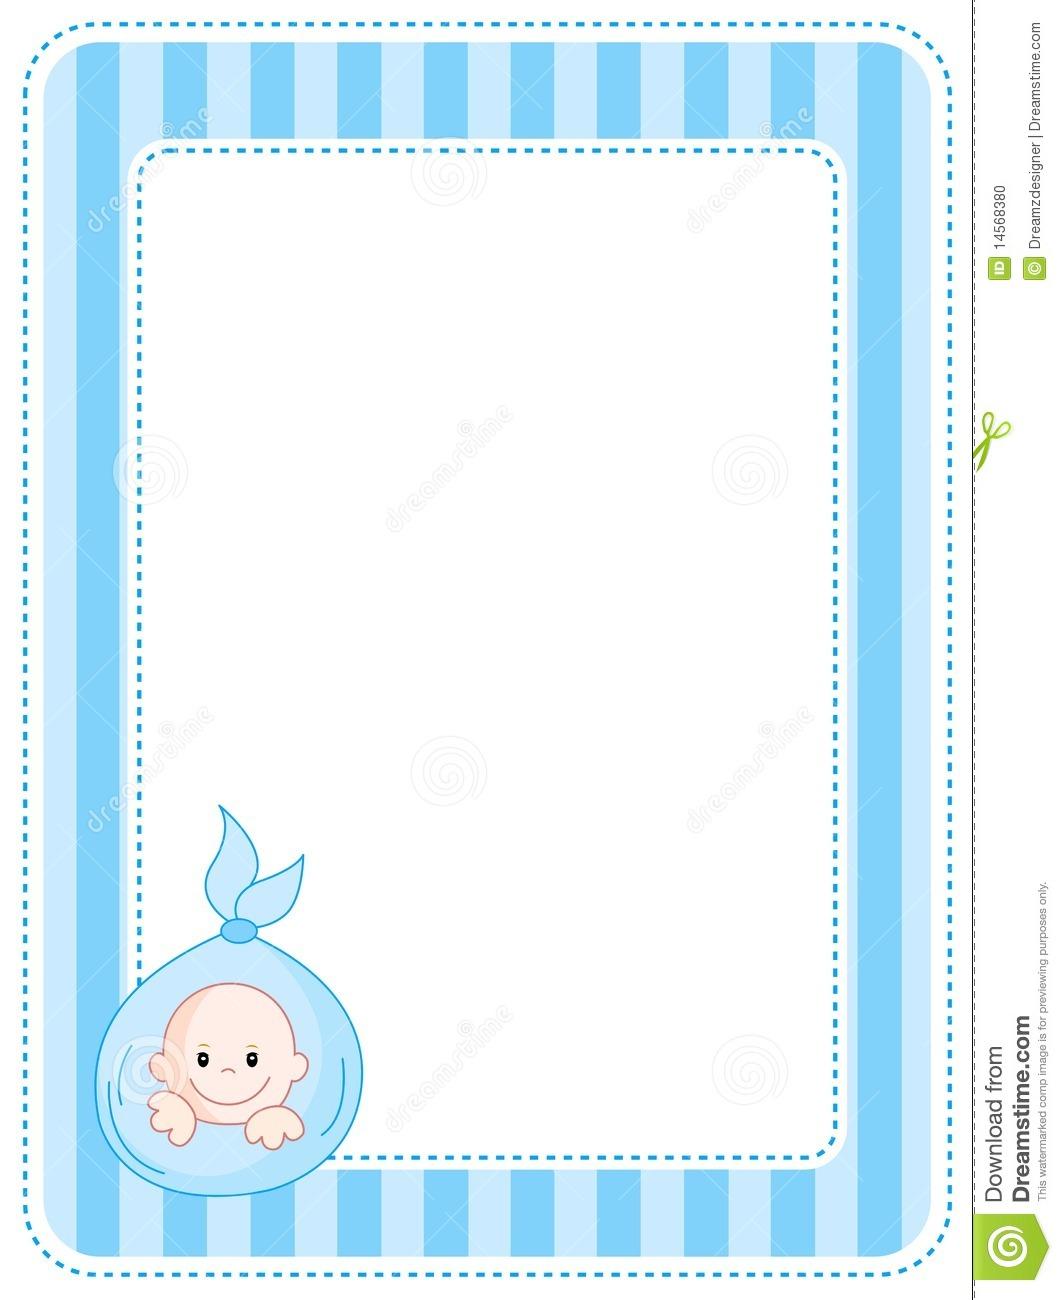 Baby clipart frame Frames Frame Boy baby photo